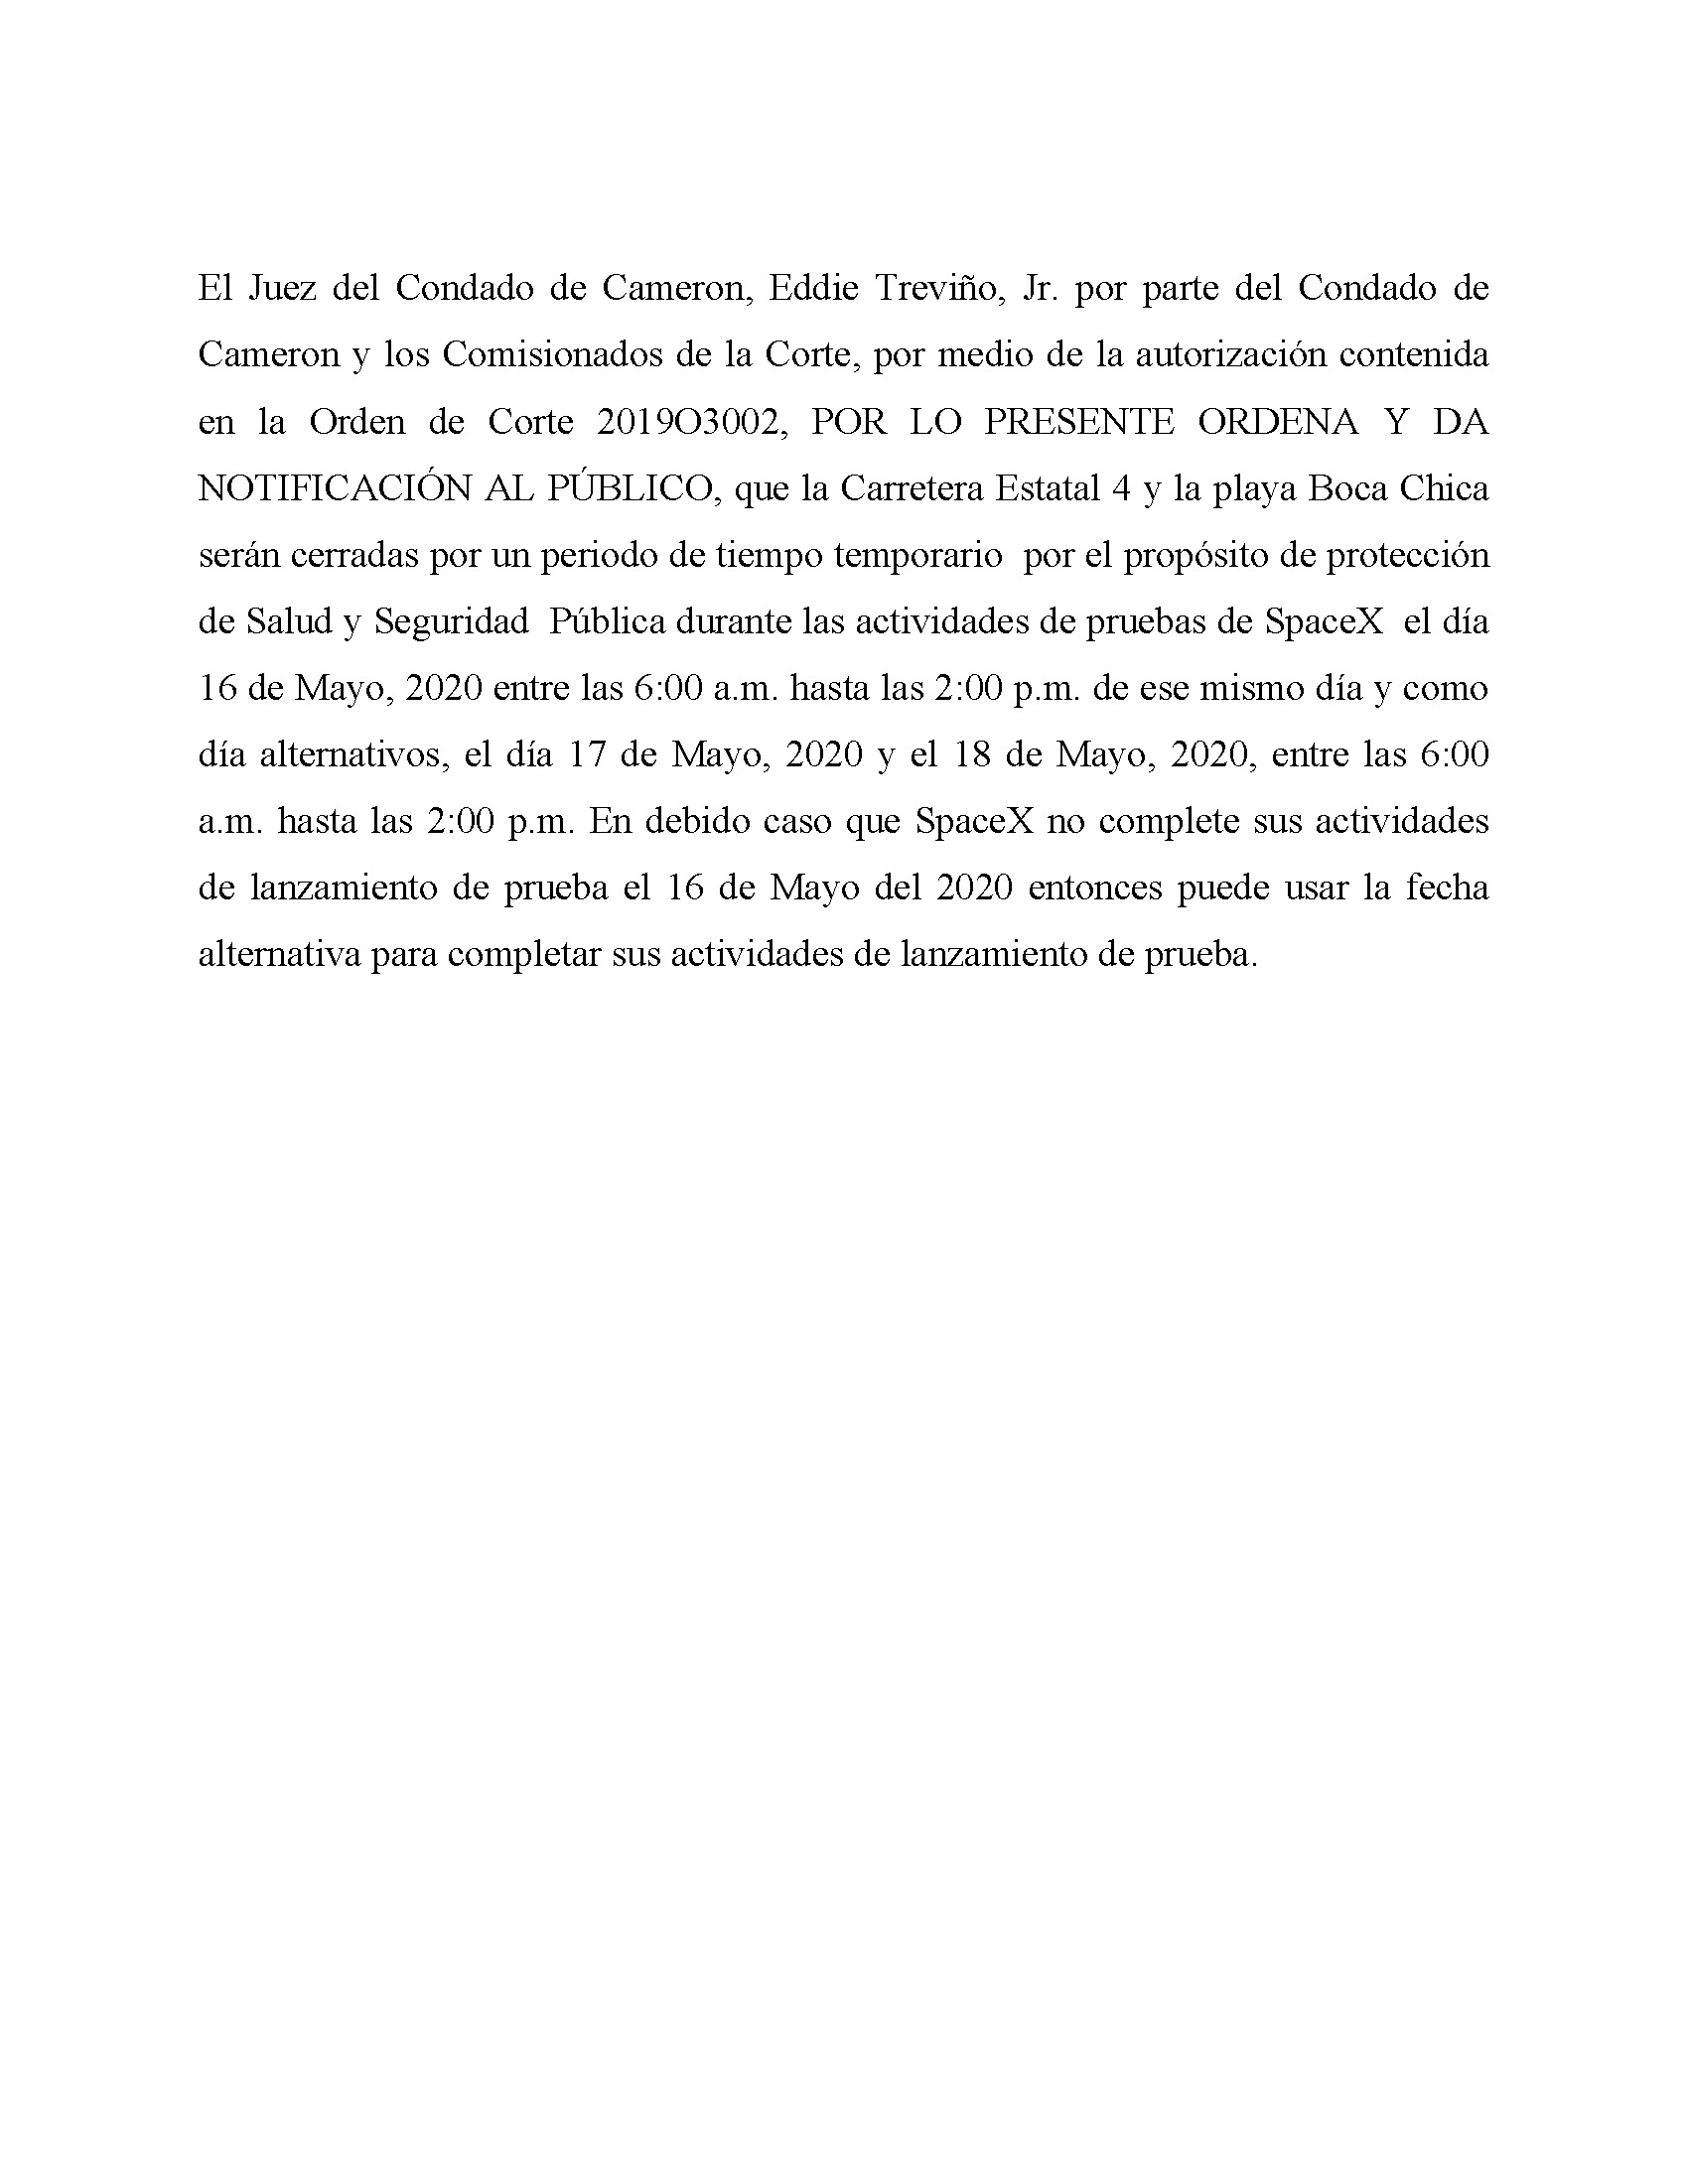 ORDER.CLOSURE OF HIGHWAY 4 Y LA PLAYA BOCA CHICA.SPANISH.05.16.20